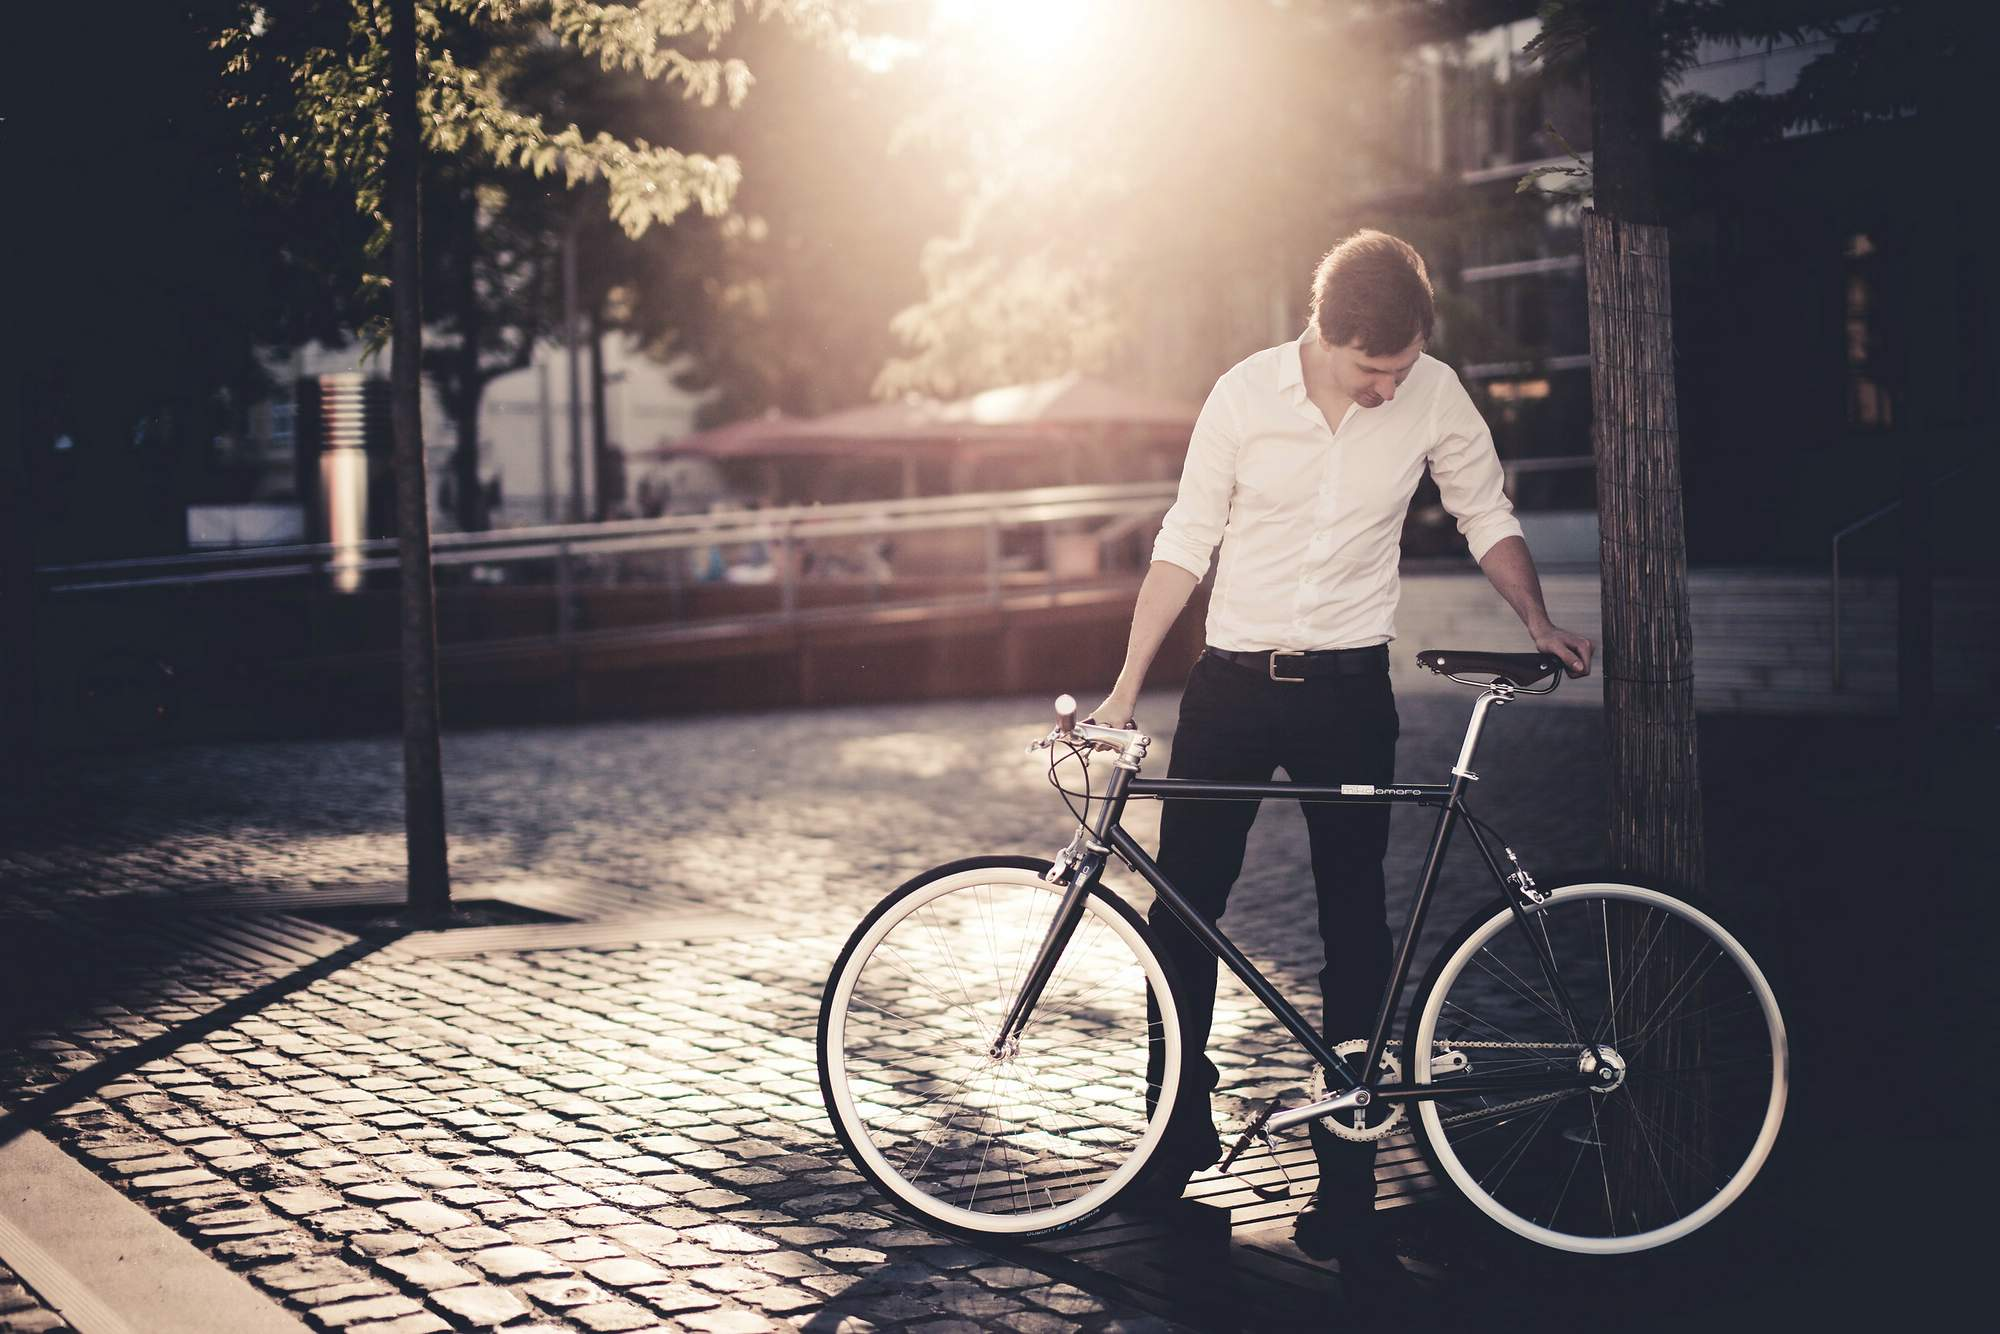 Urban Bike cushy black 3 Speed, summer time